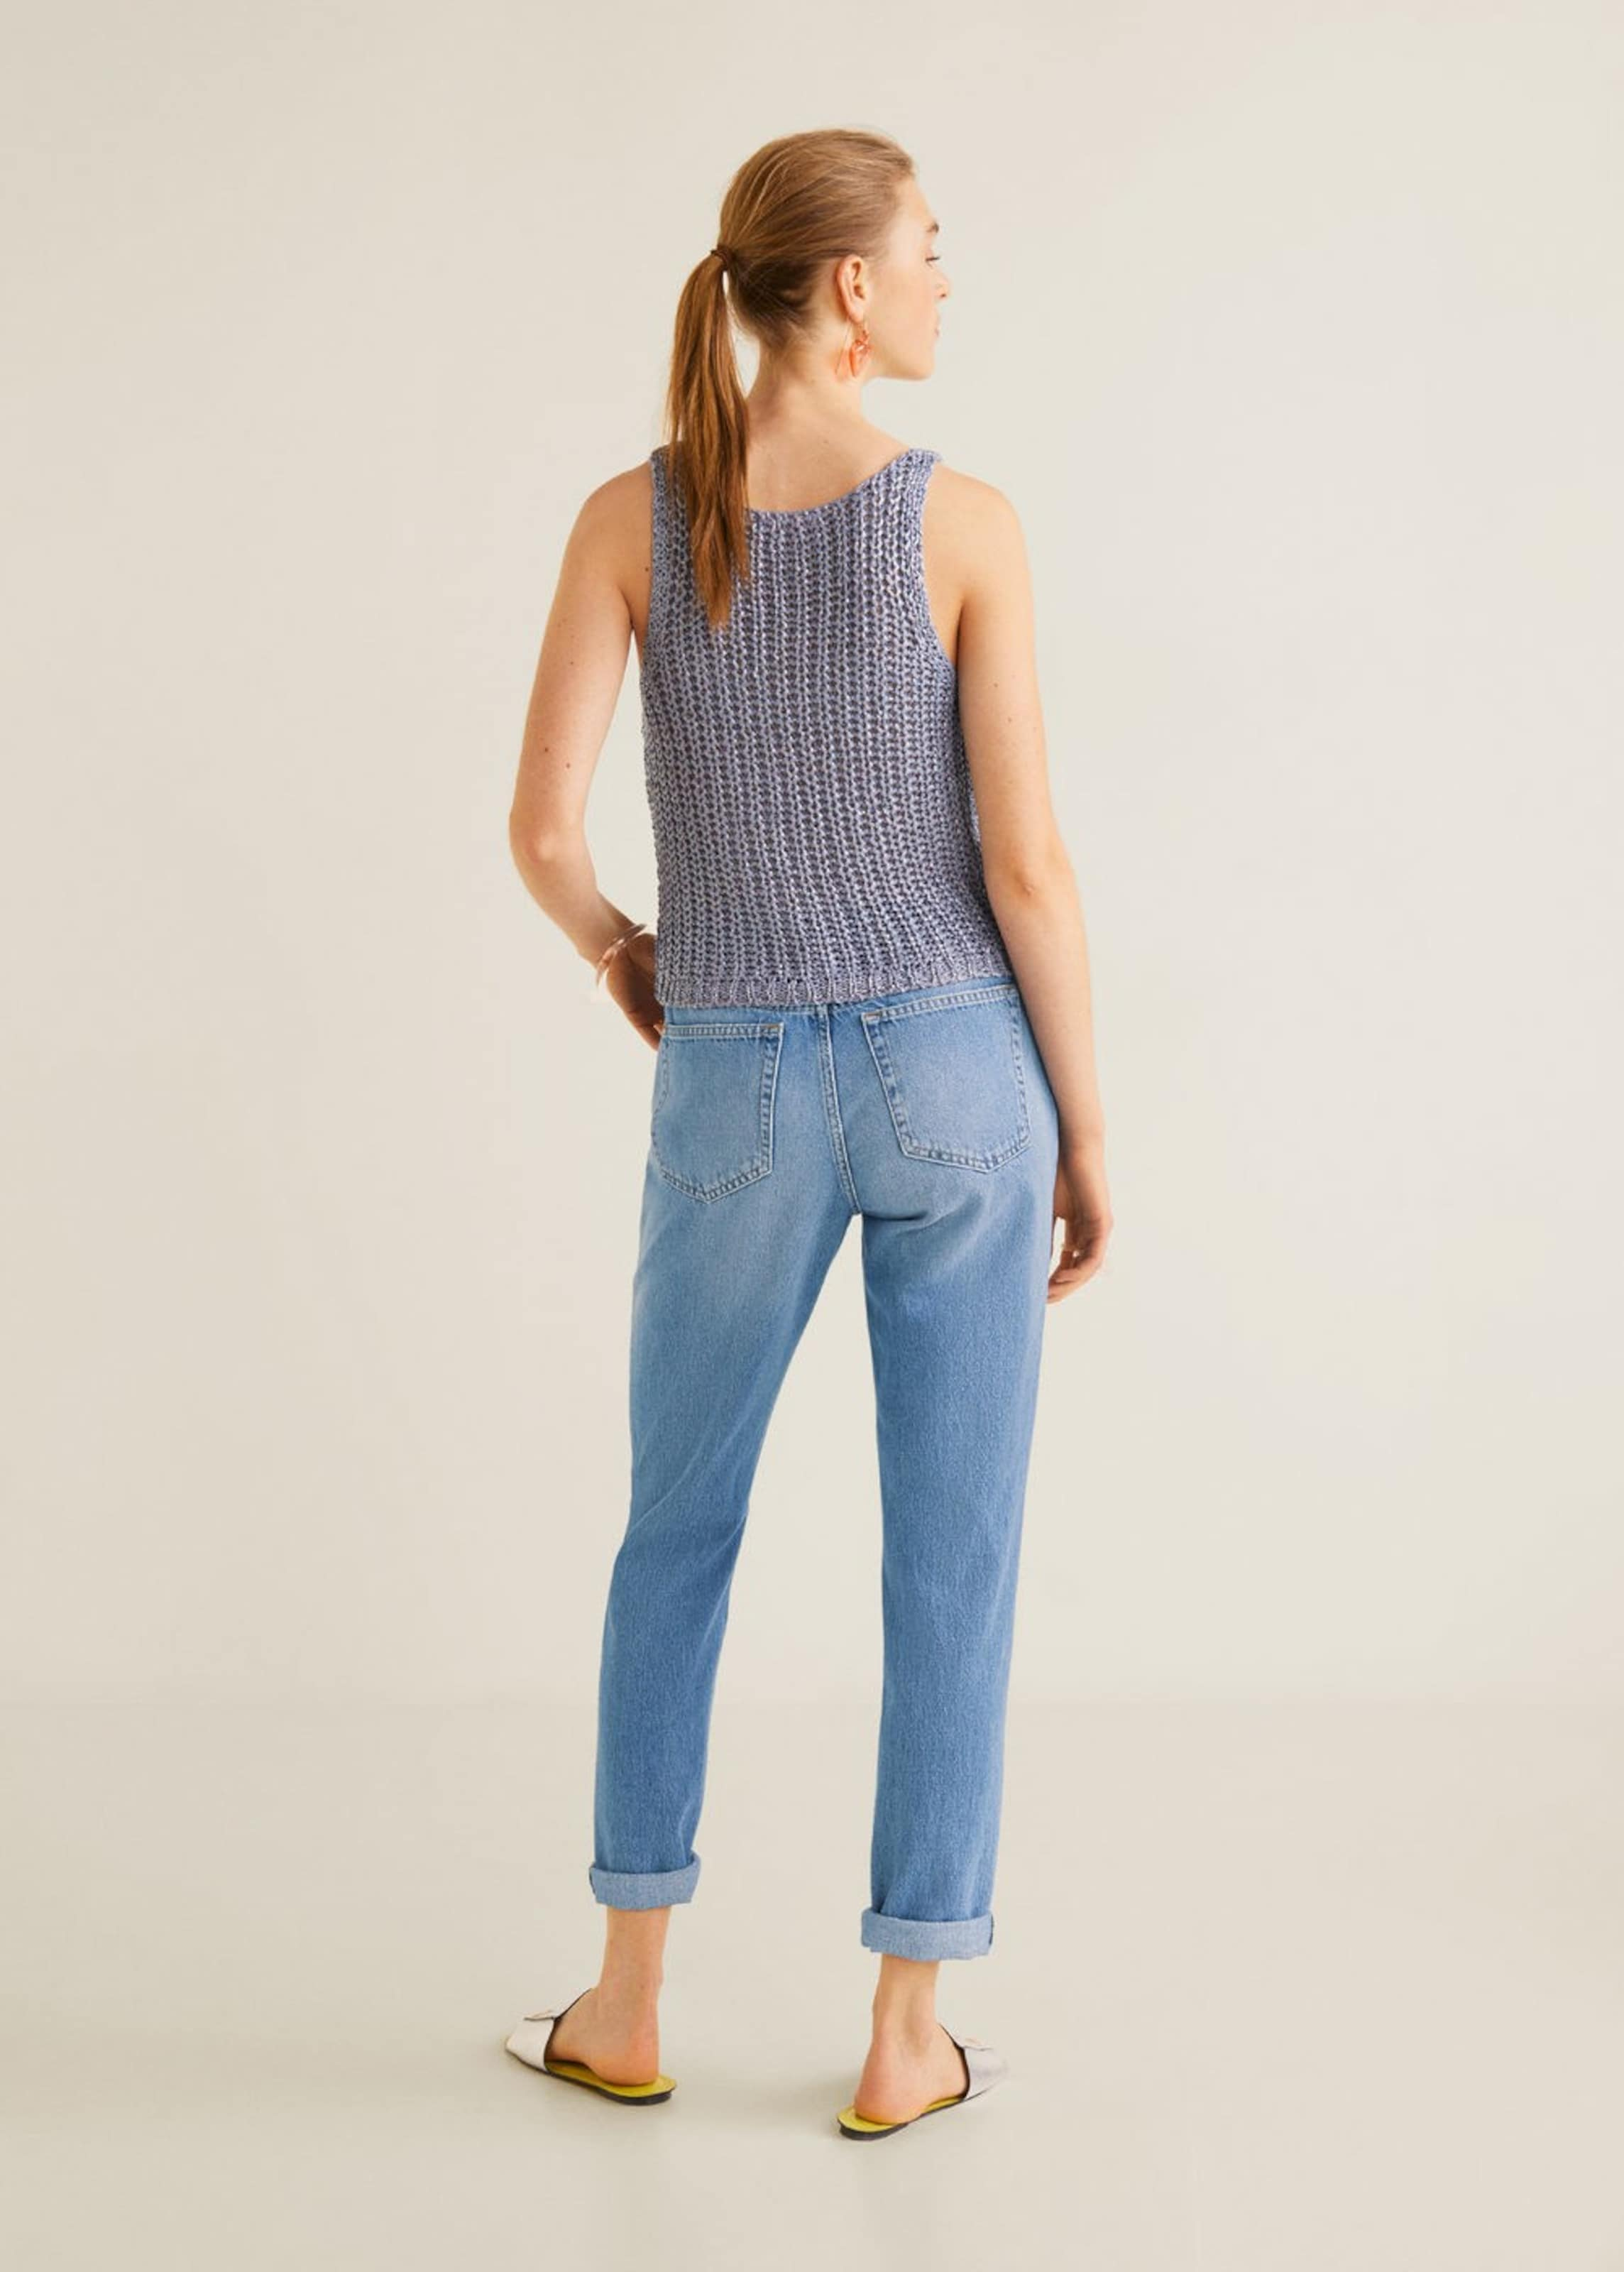 Mango Jeans Denim In 'relax' Blue OkXTiZuP